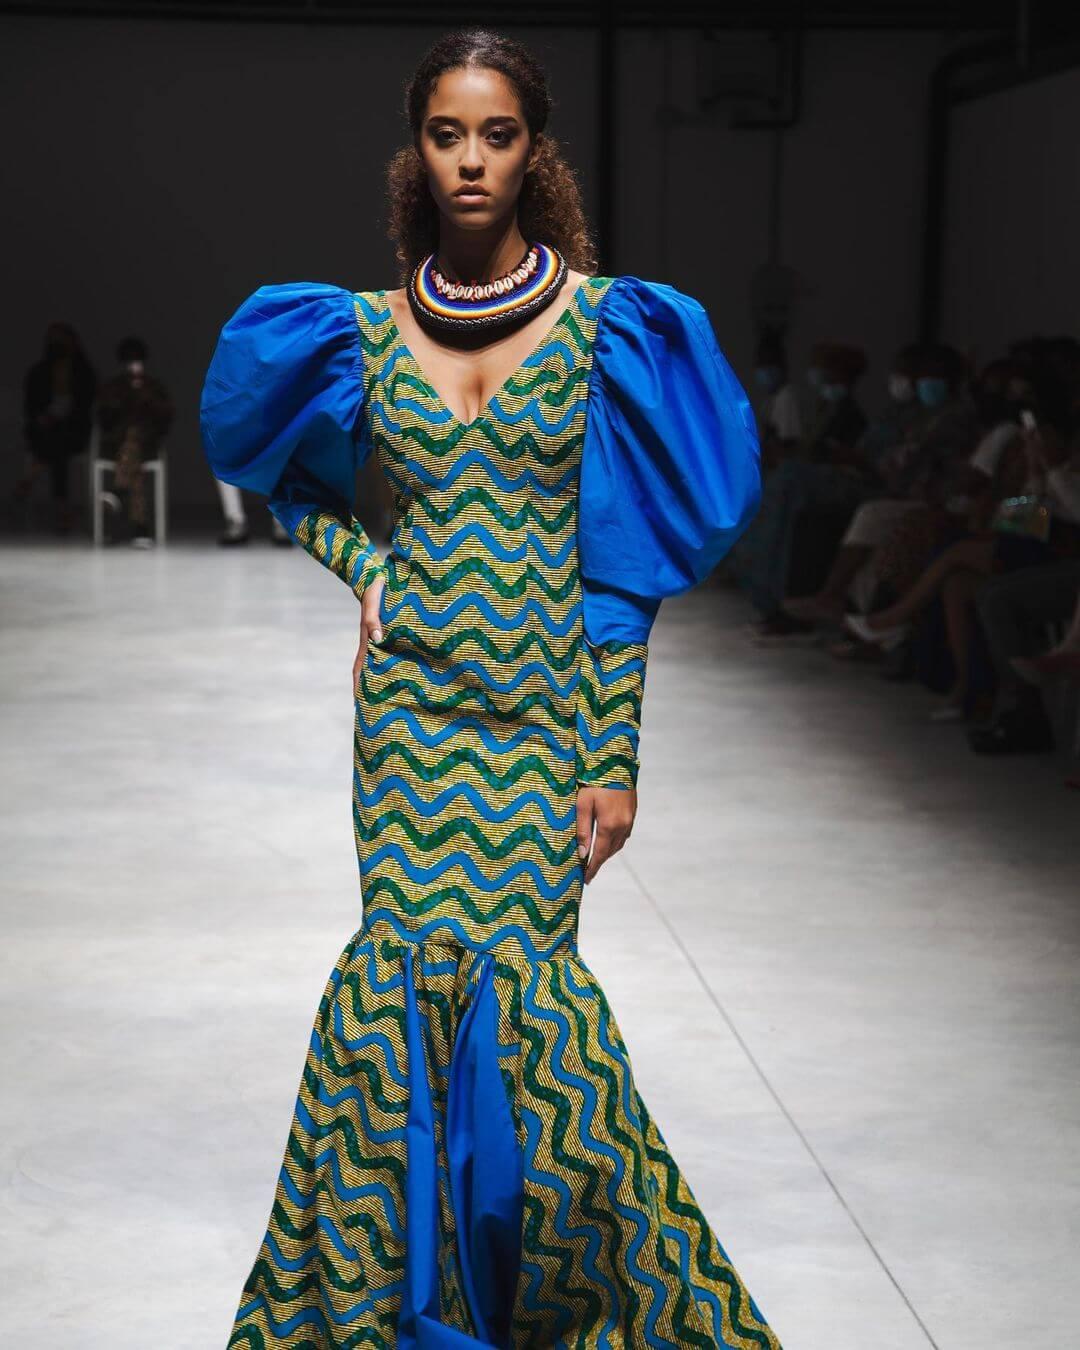 afro fashion week sesta edizione milano sett 2021 Life&People Magazine